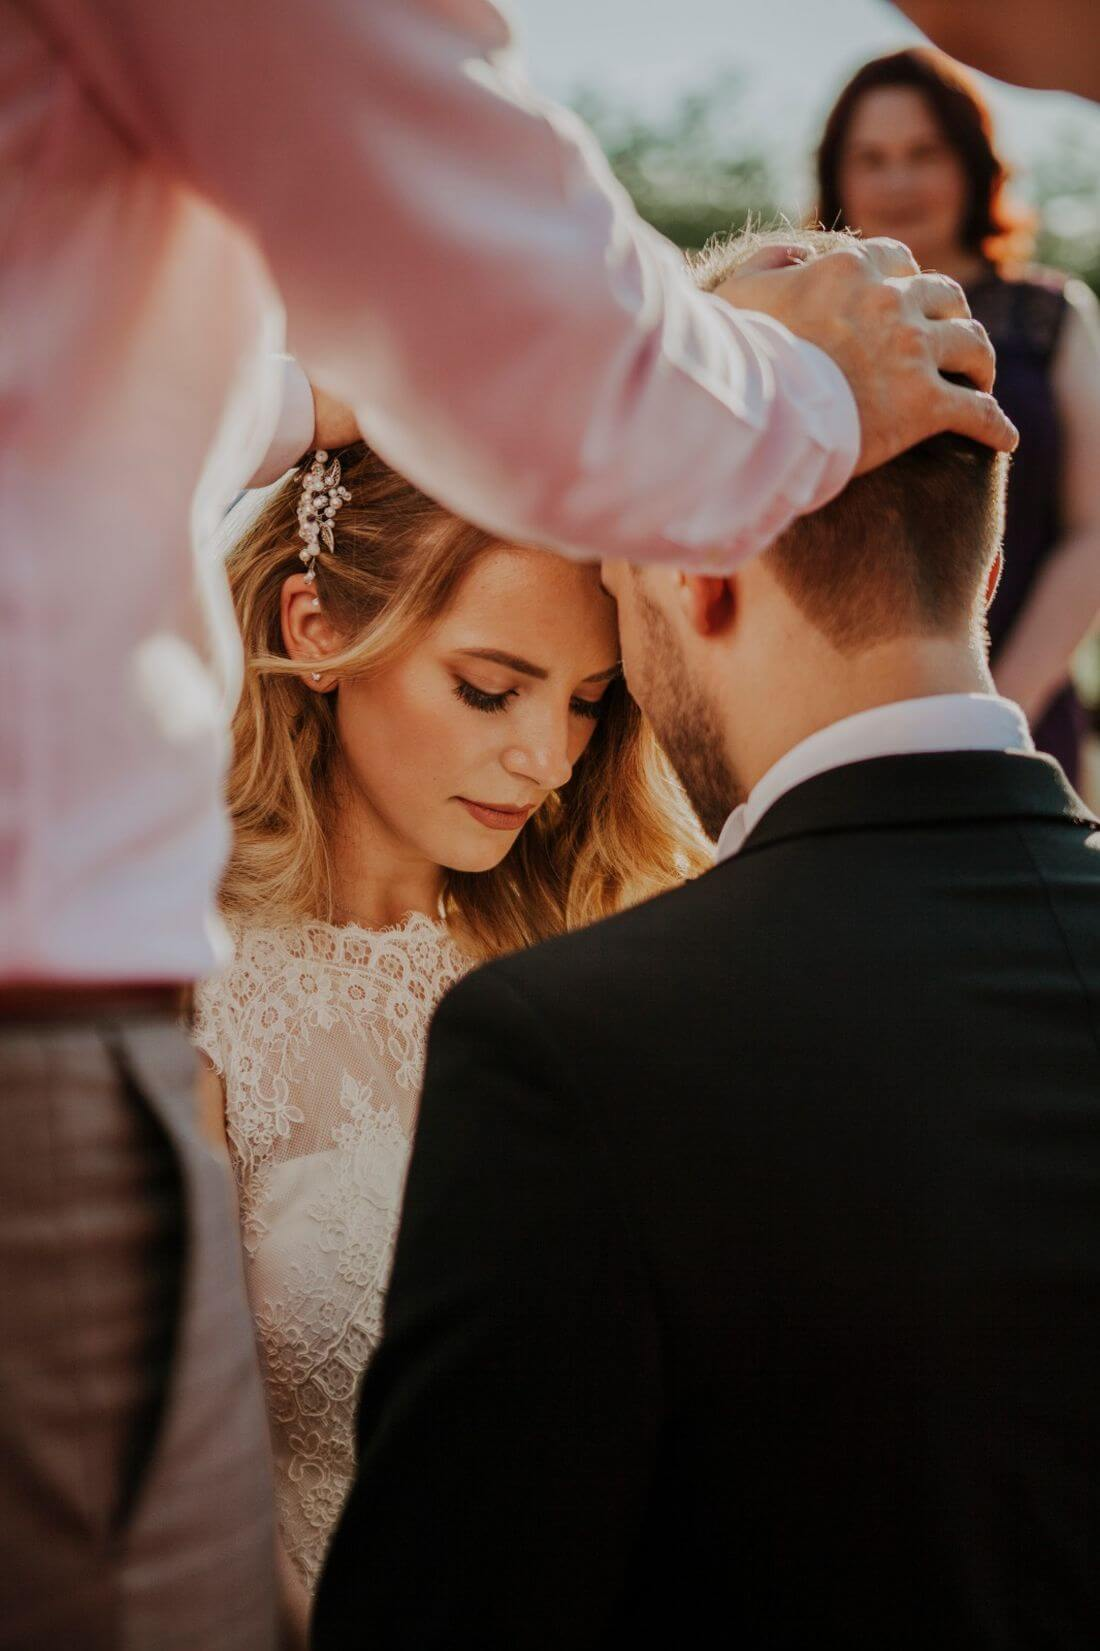 Nunta pe note muzicale – Ana-Maria si Robert – IDO-Weddings-nuntiinaerliber (7)